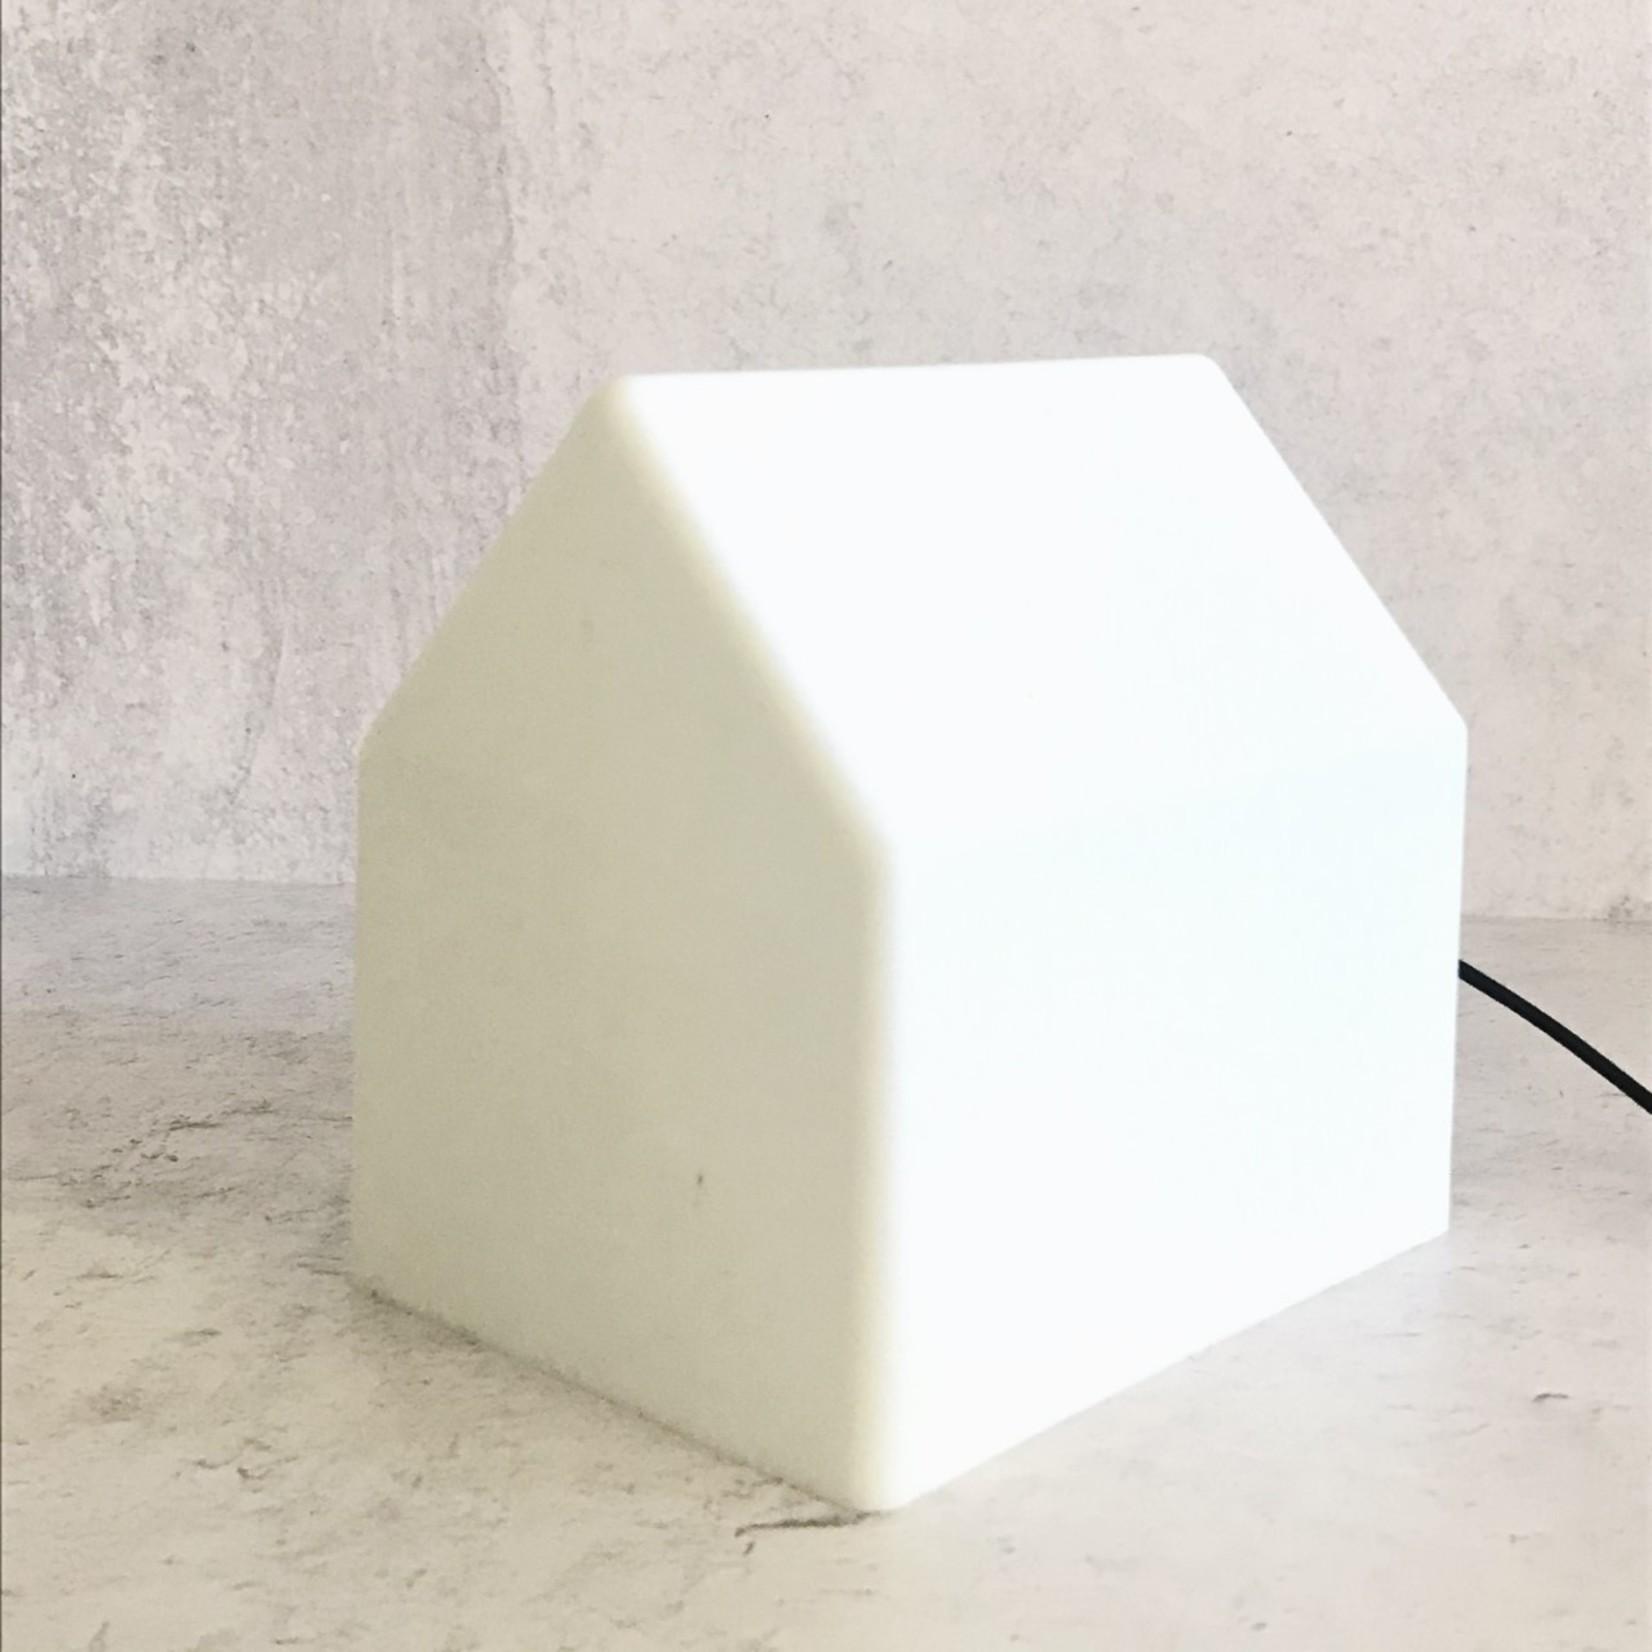 SKUK Book Rest Lamp Universal